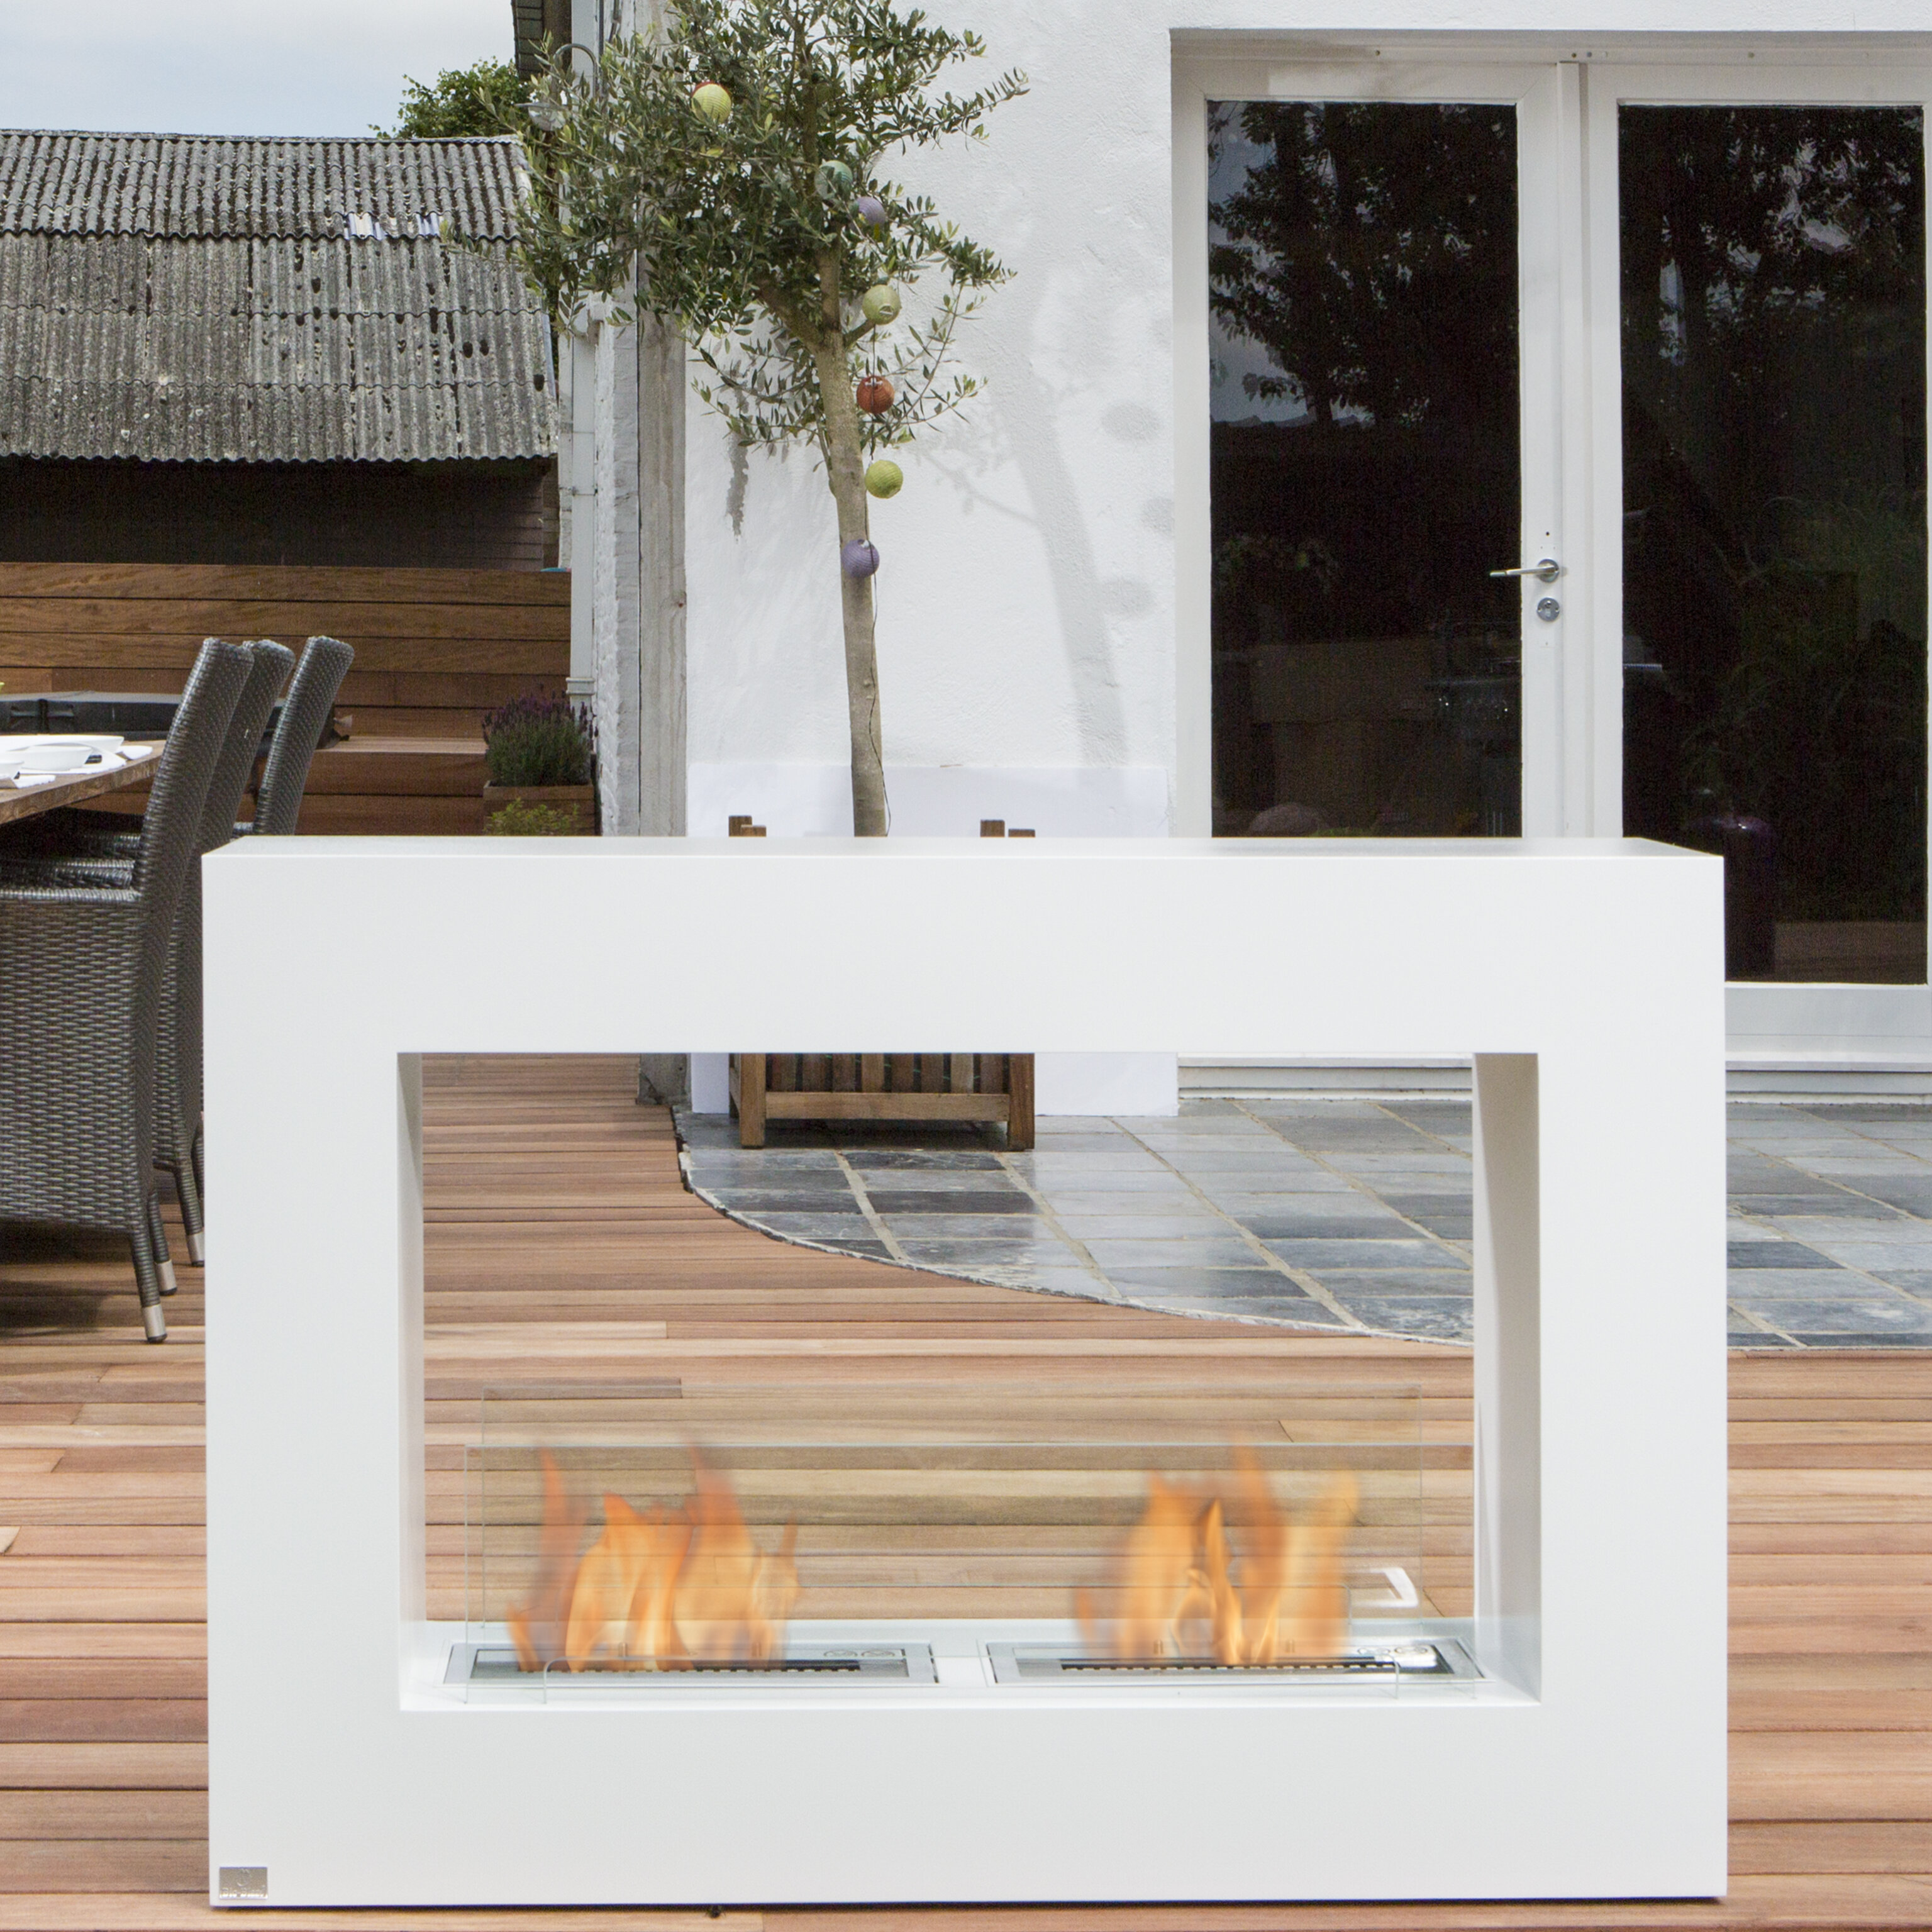 Bio-Blaze Qube Stainless Steel Bio-Ethanol Fuel Outdoor Fireplace ...